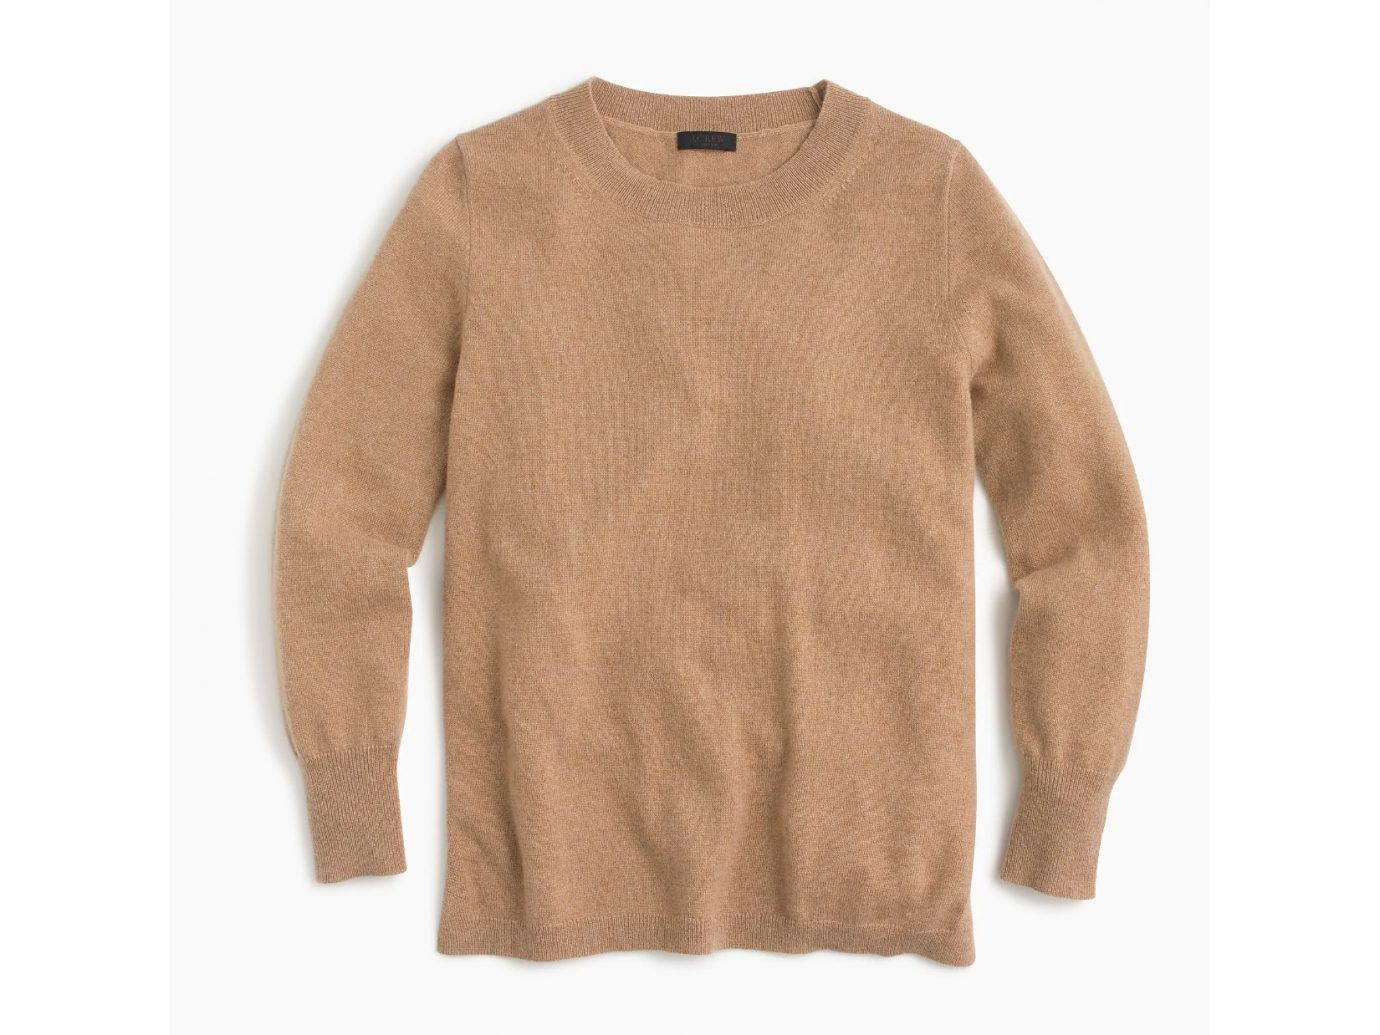 J. Crew three-quarter sleeve everyday cashmere crewneck sweater